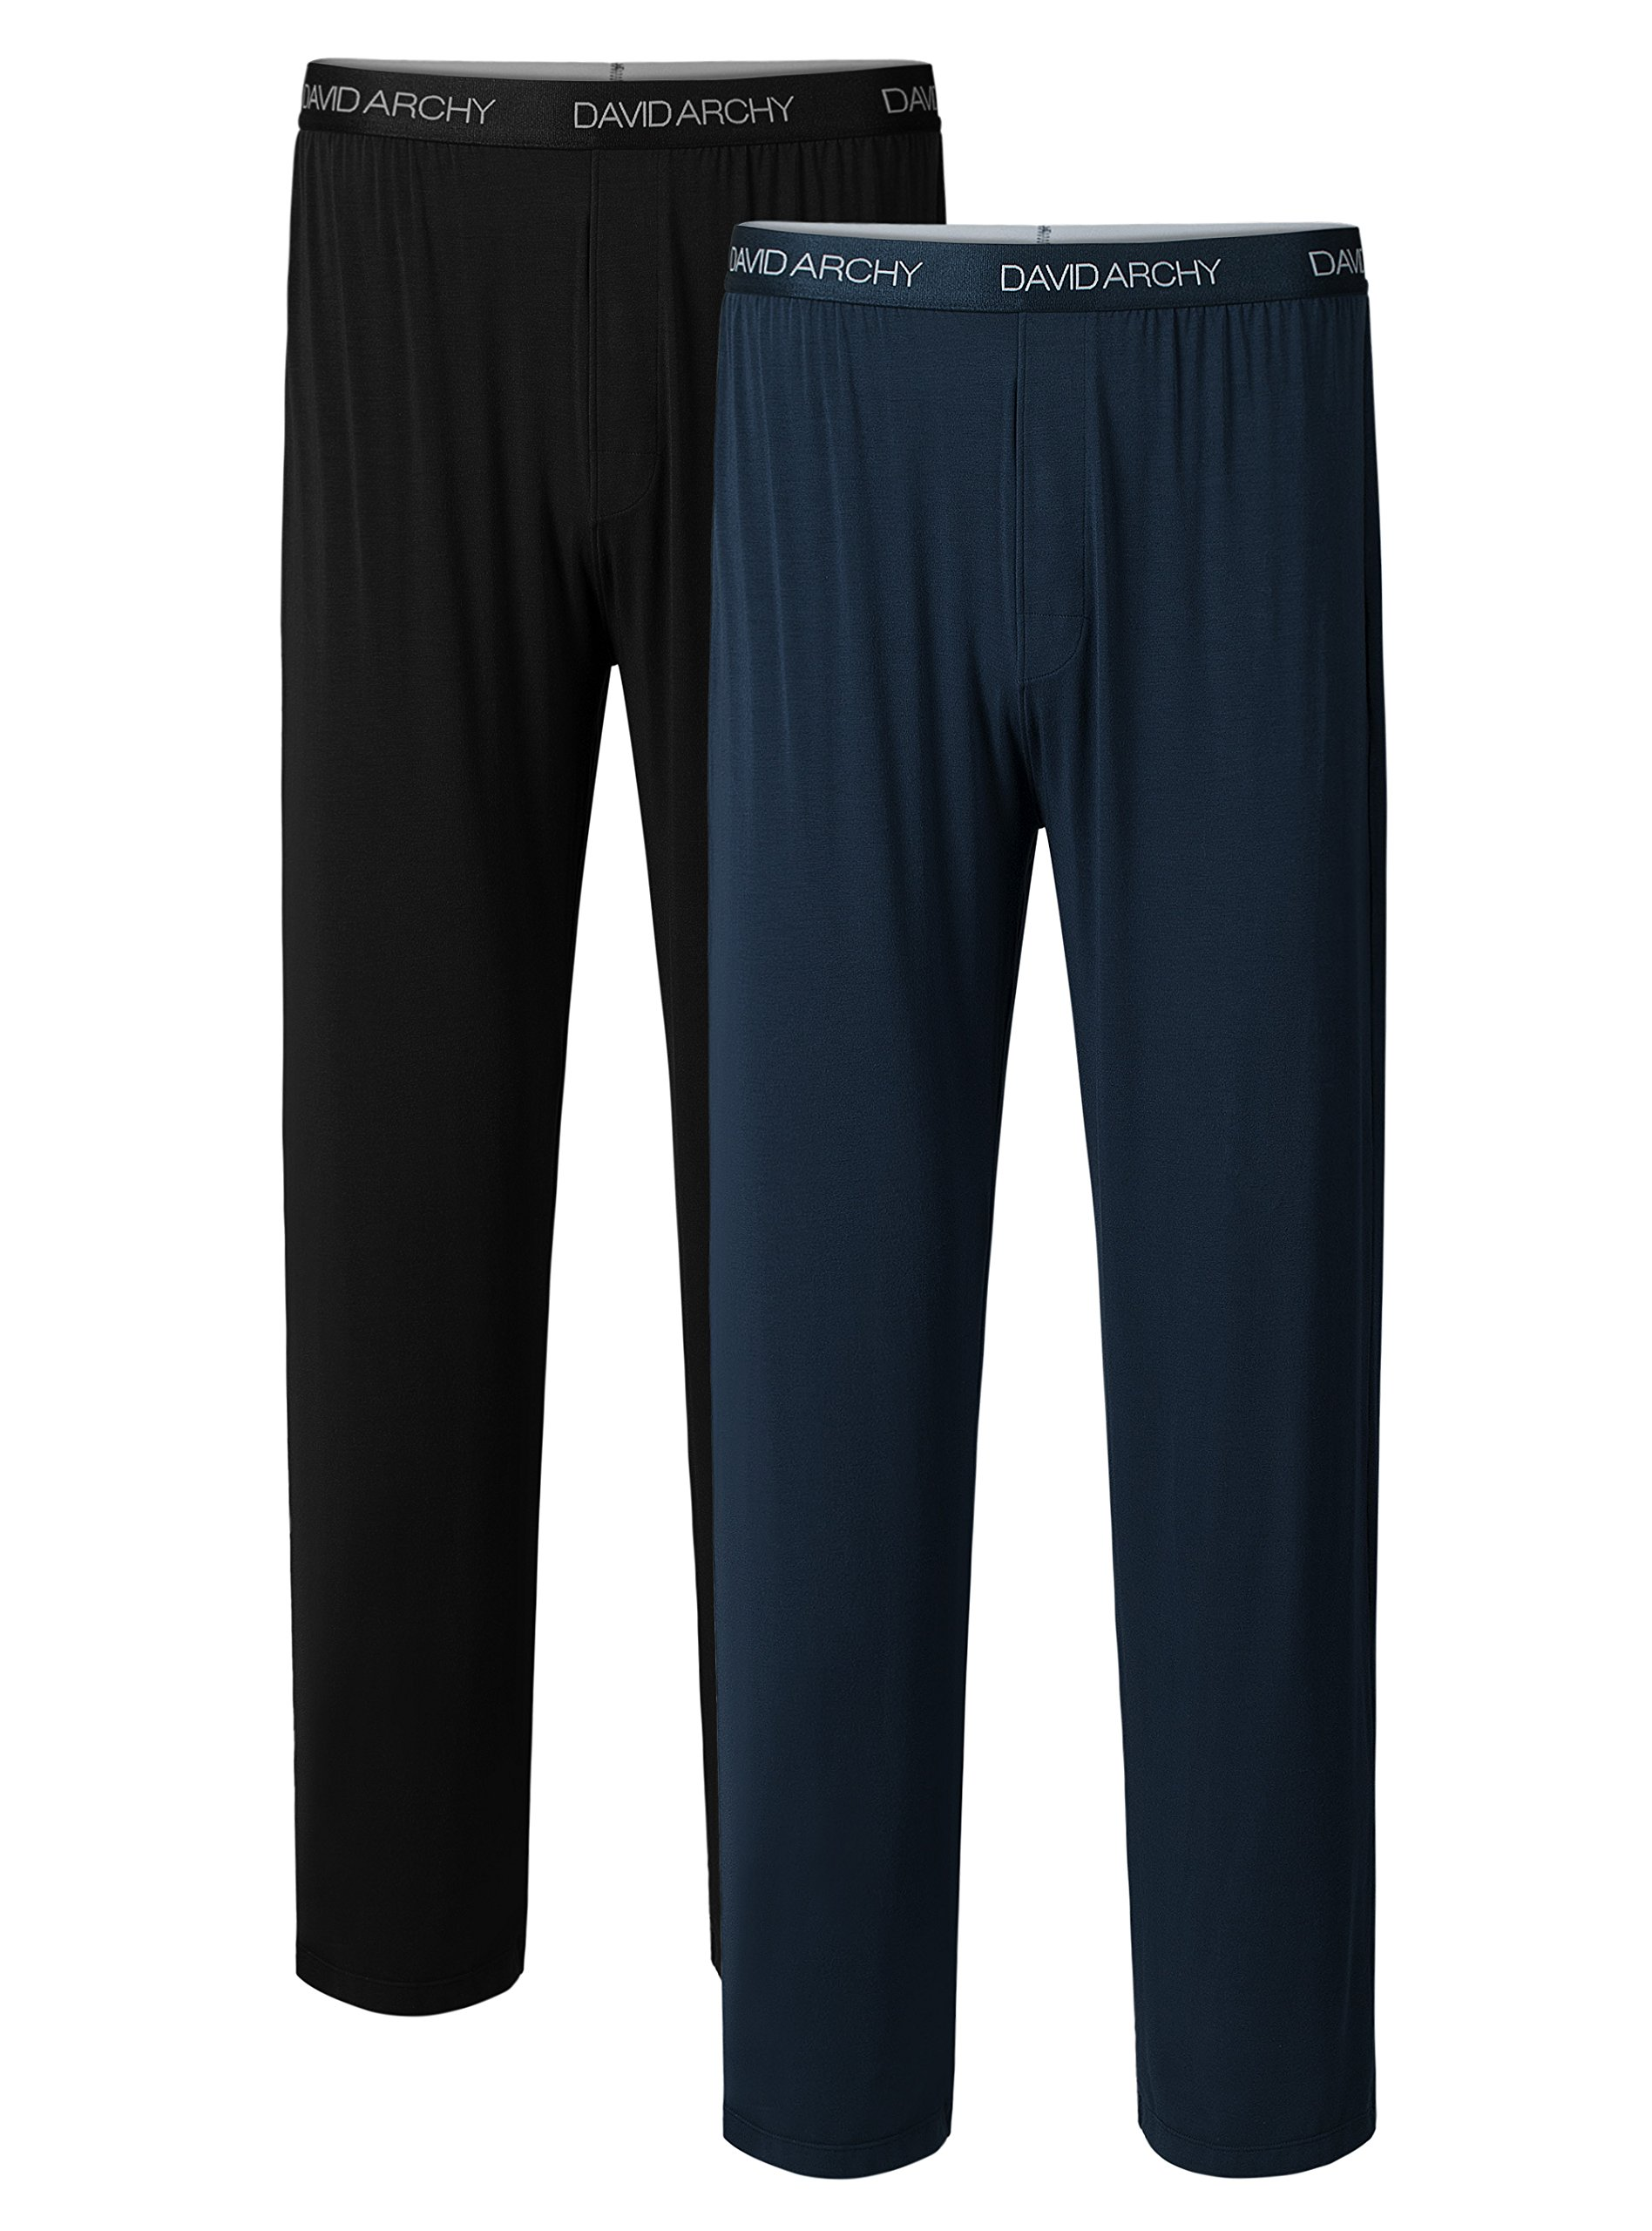 David Archy Men's 2 Pack Bamboo Long Pajamas Pants Loungewear Sleep Bottoms (M, Black+Navy Blue)